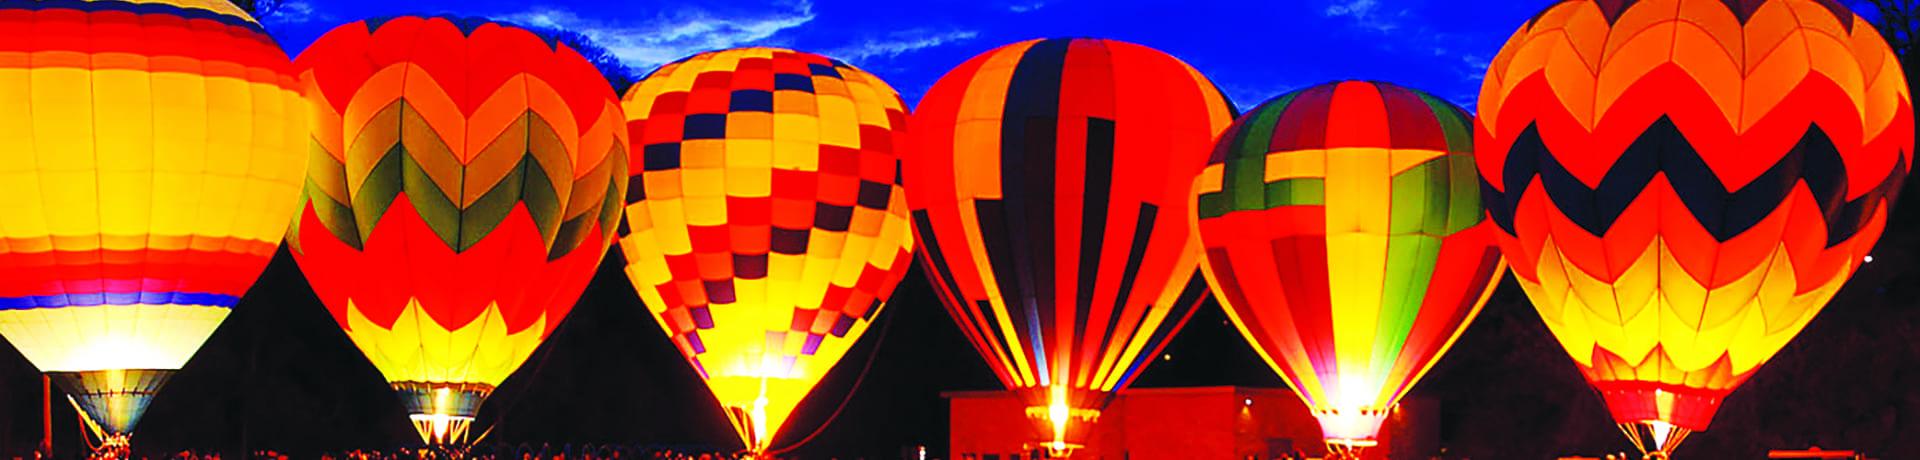 Six air balloons